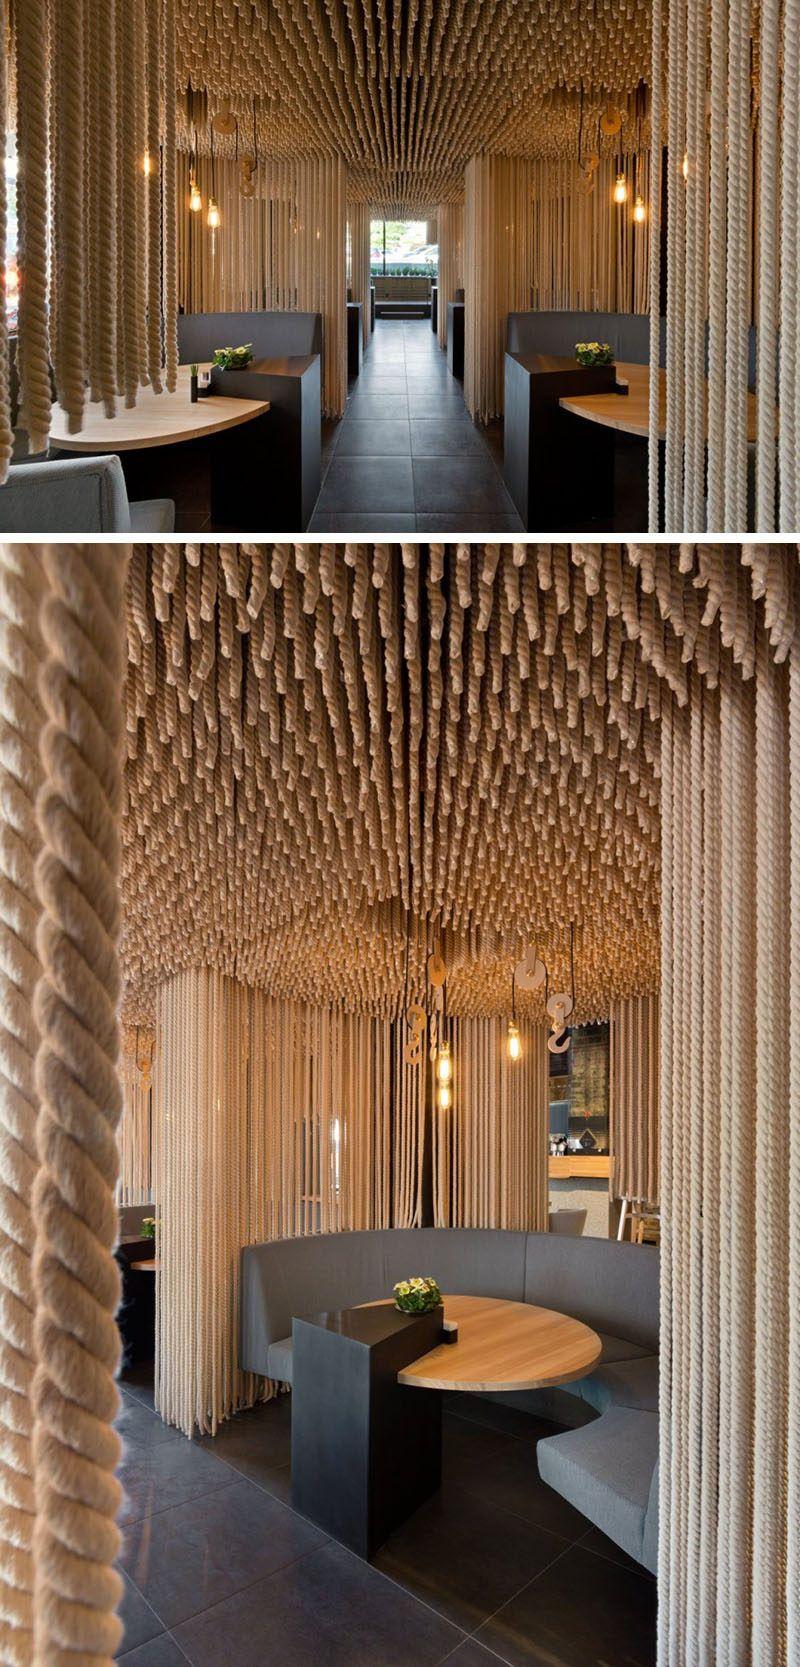 15 Creative Ideas For Room Dividers Restaurant Interior Design Restaurant Interior Interior Architecture Design